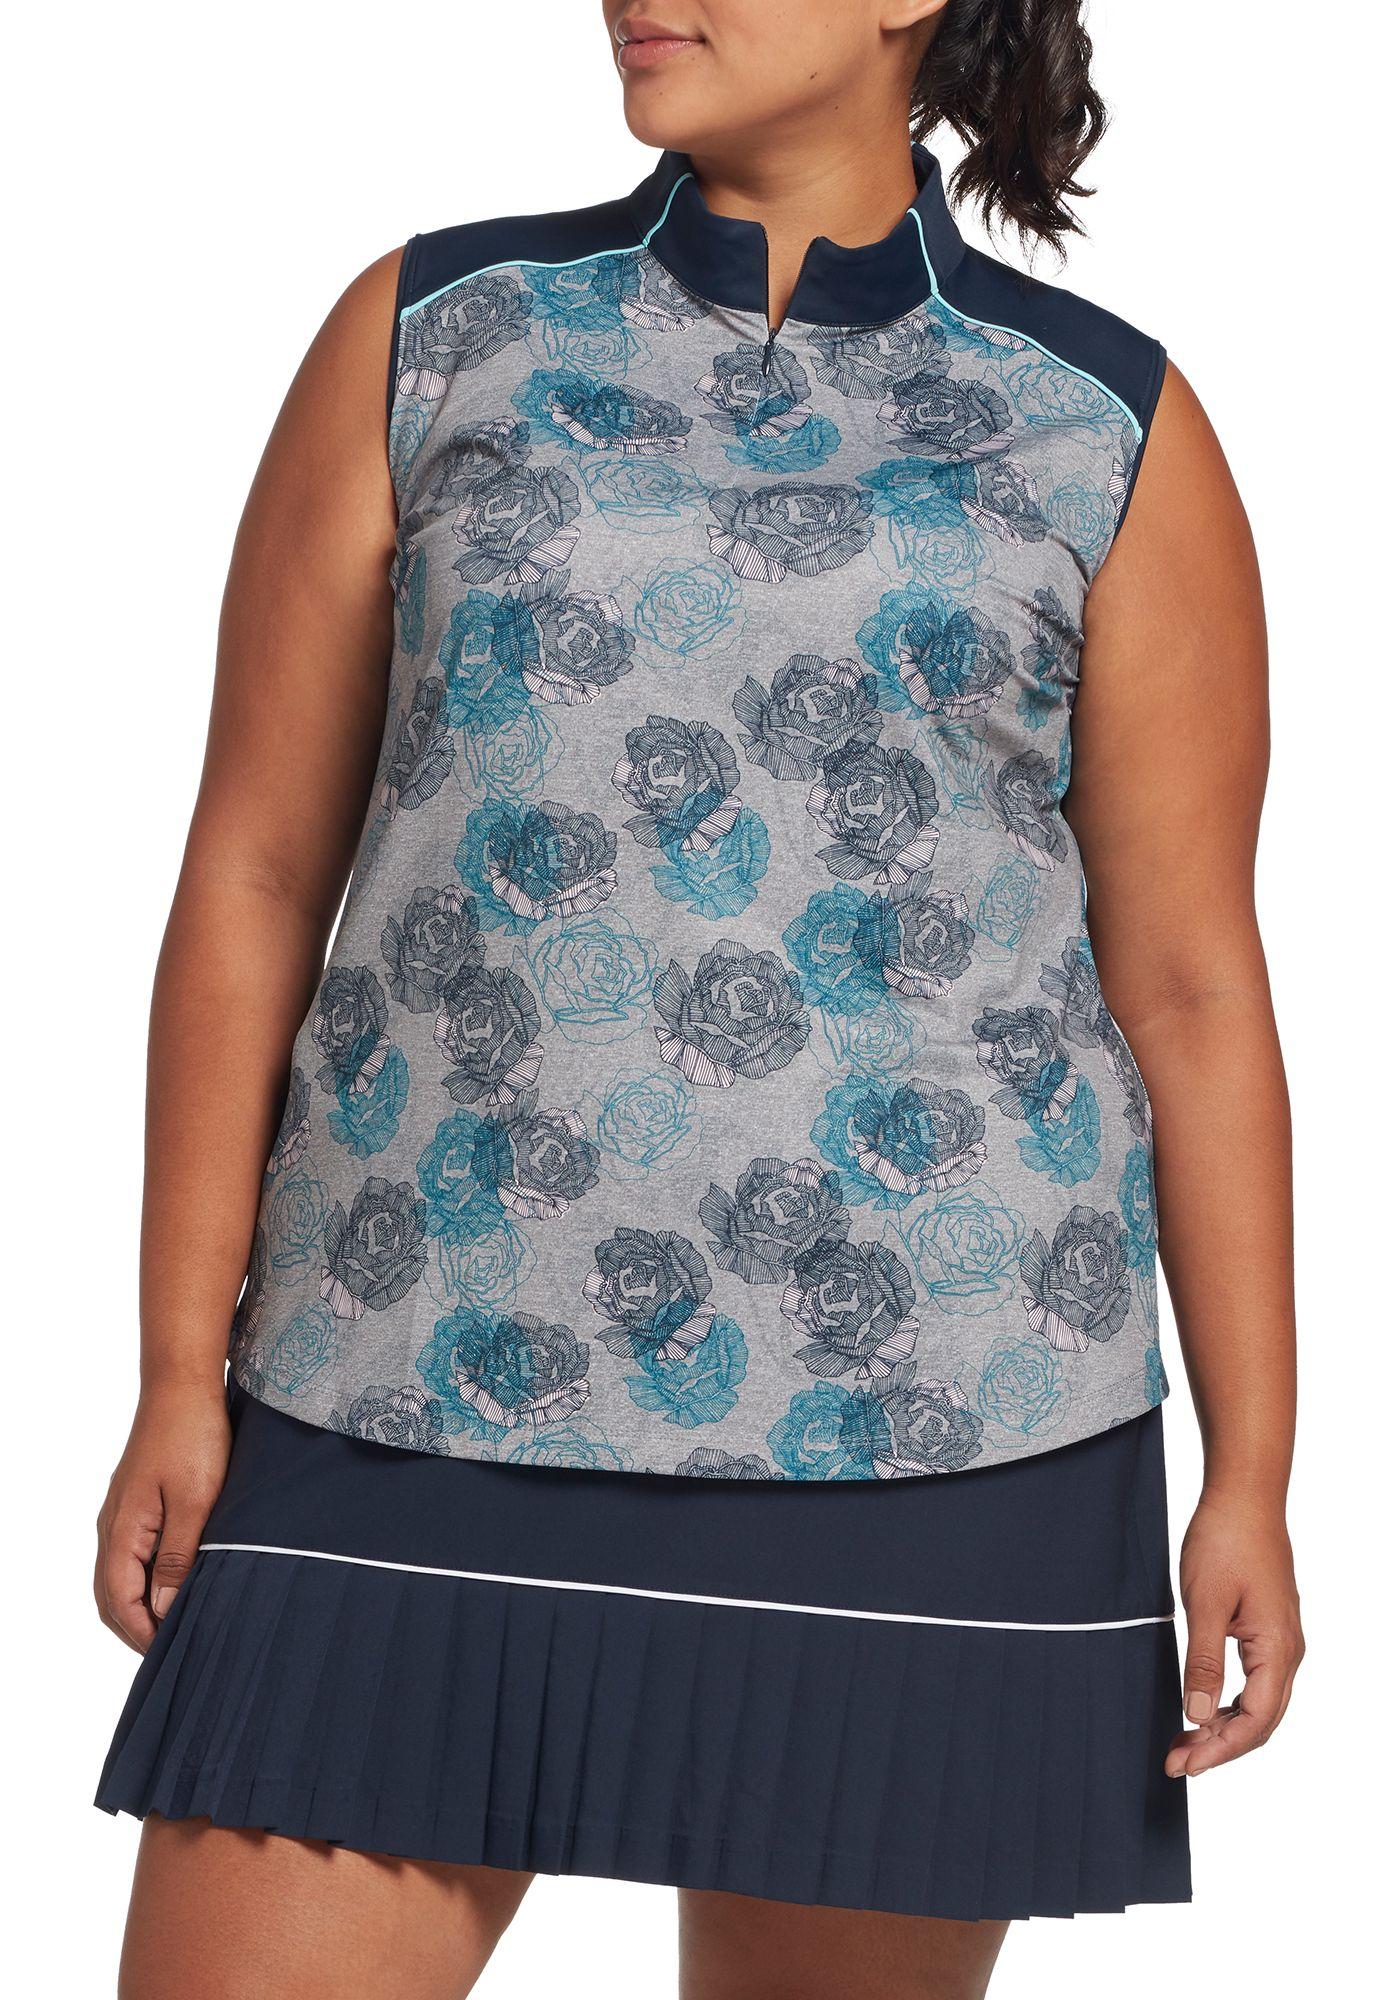 Lady Hagen Women's Floral Print Mock Neck Sleeveless Golf Polo – Extended Sizes